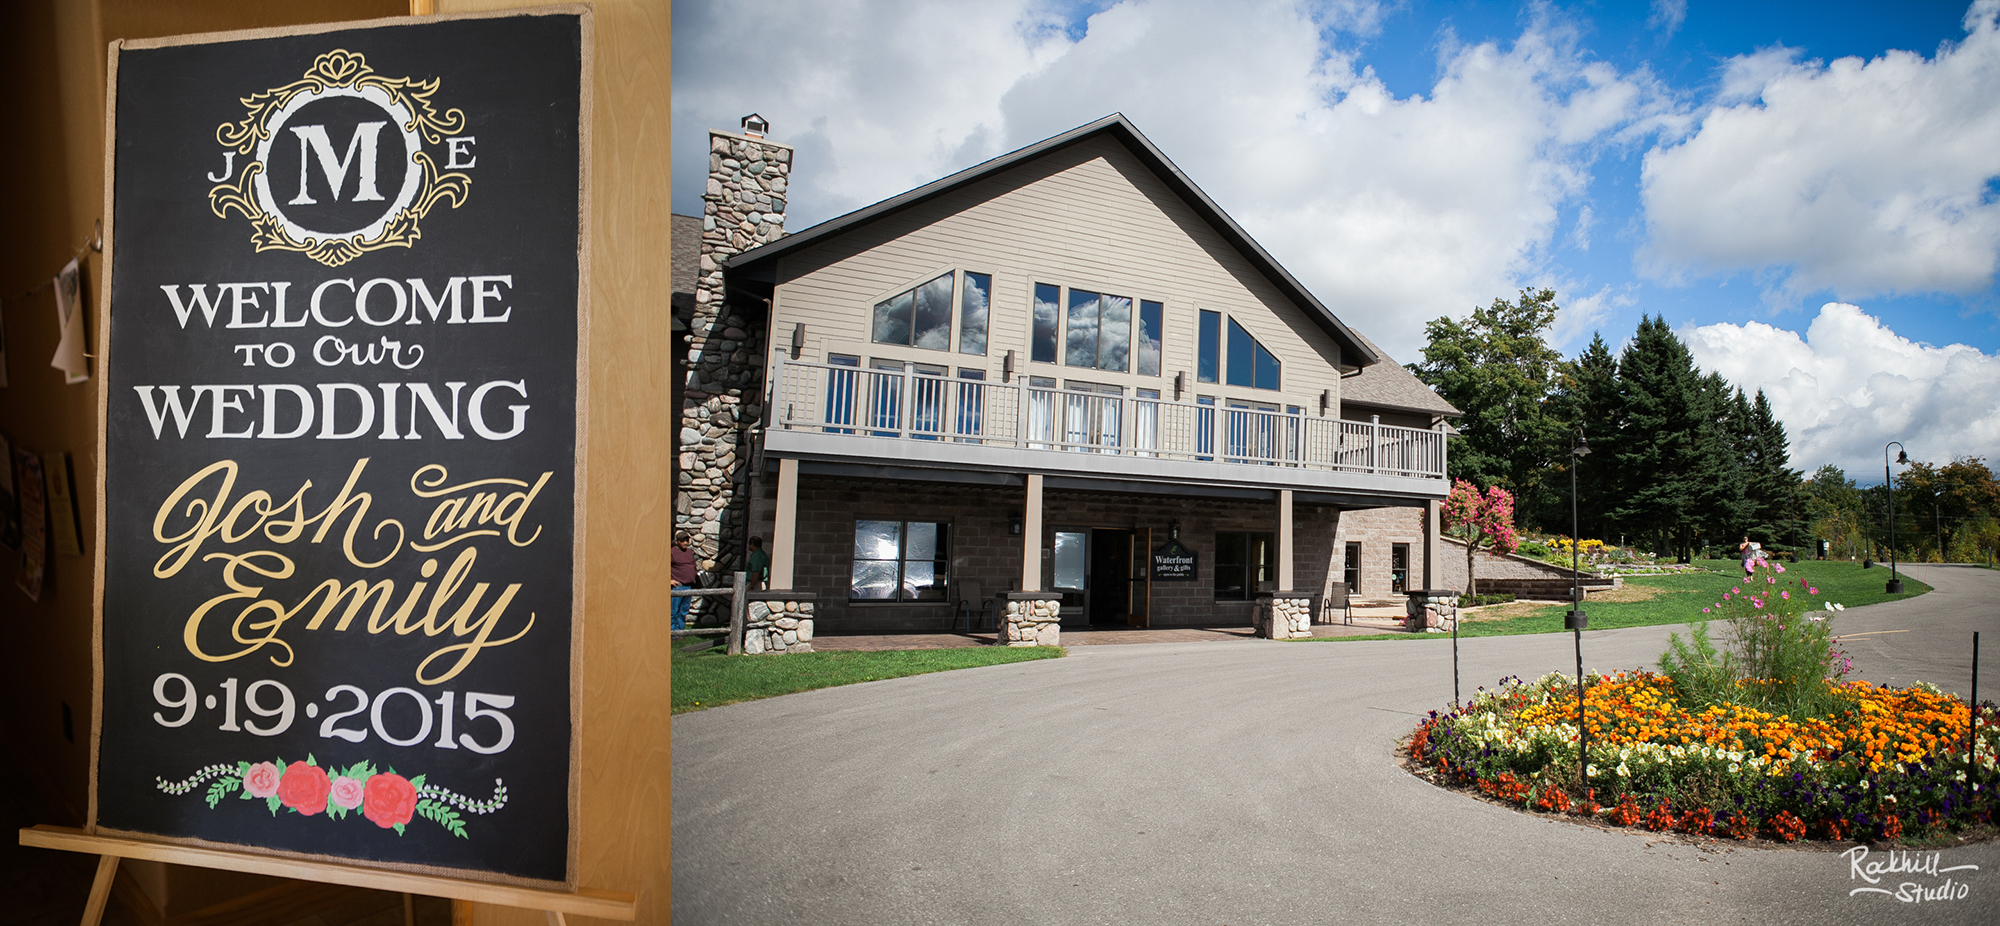 Rockhill-studio-curtis-michigan-wedding-upper-peninsula-erickson-center-venue.jpg